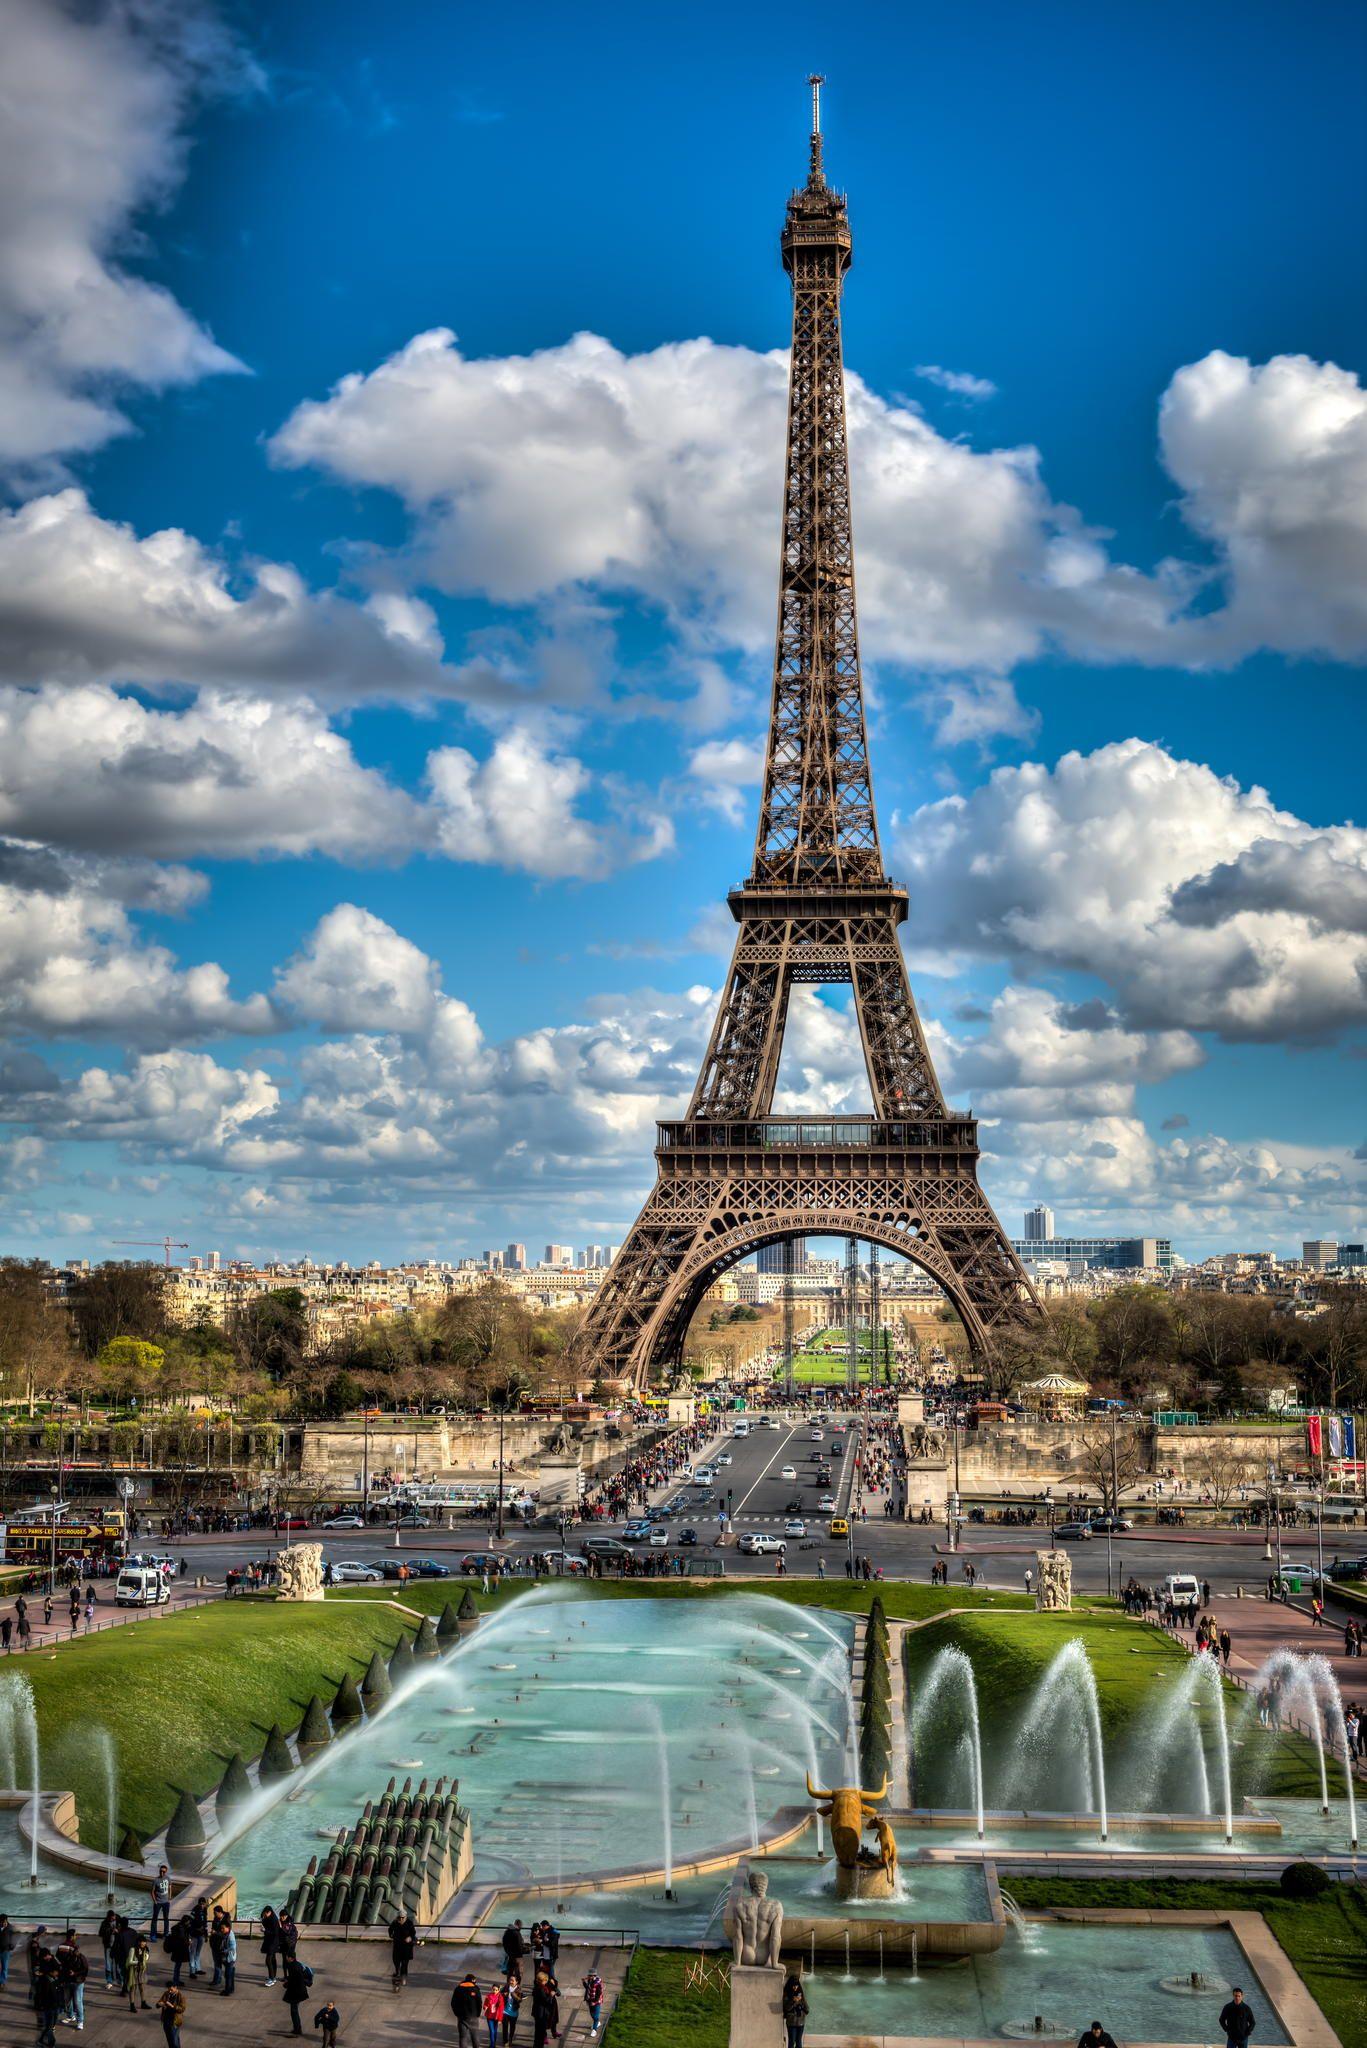 Postcard Paris by Brandon Donnelly on 500px